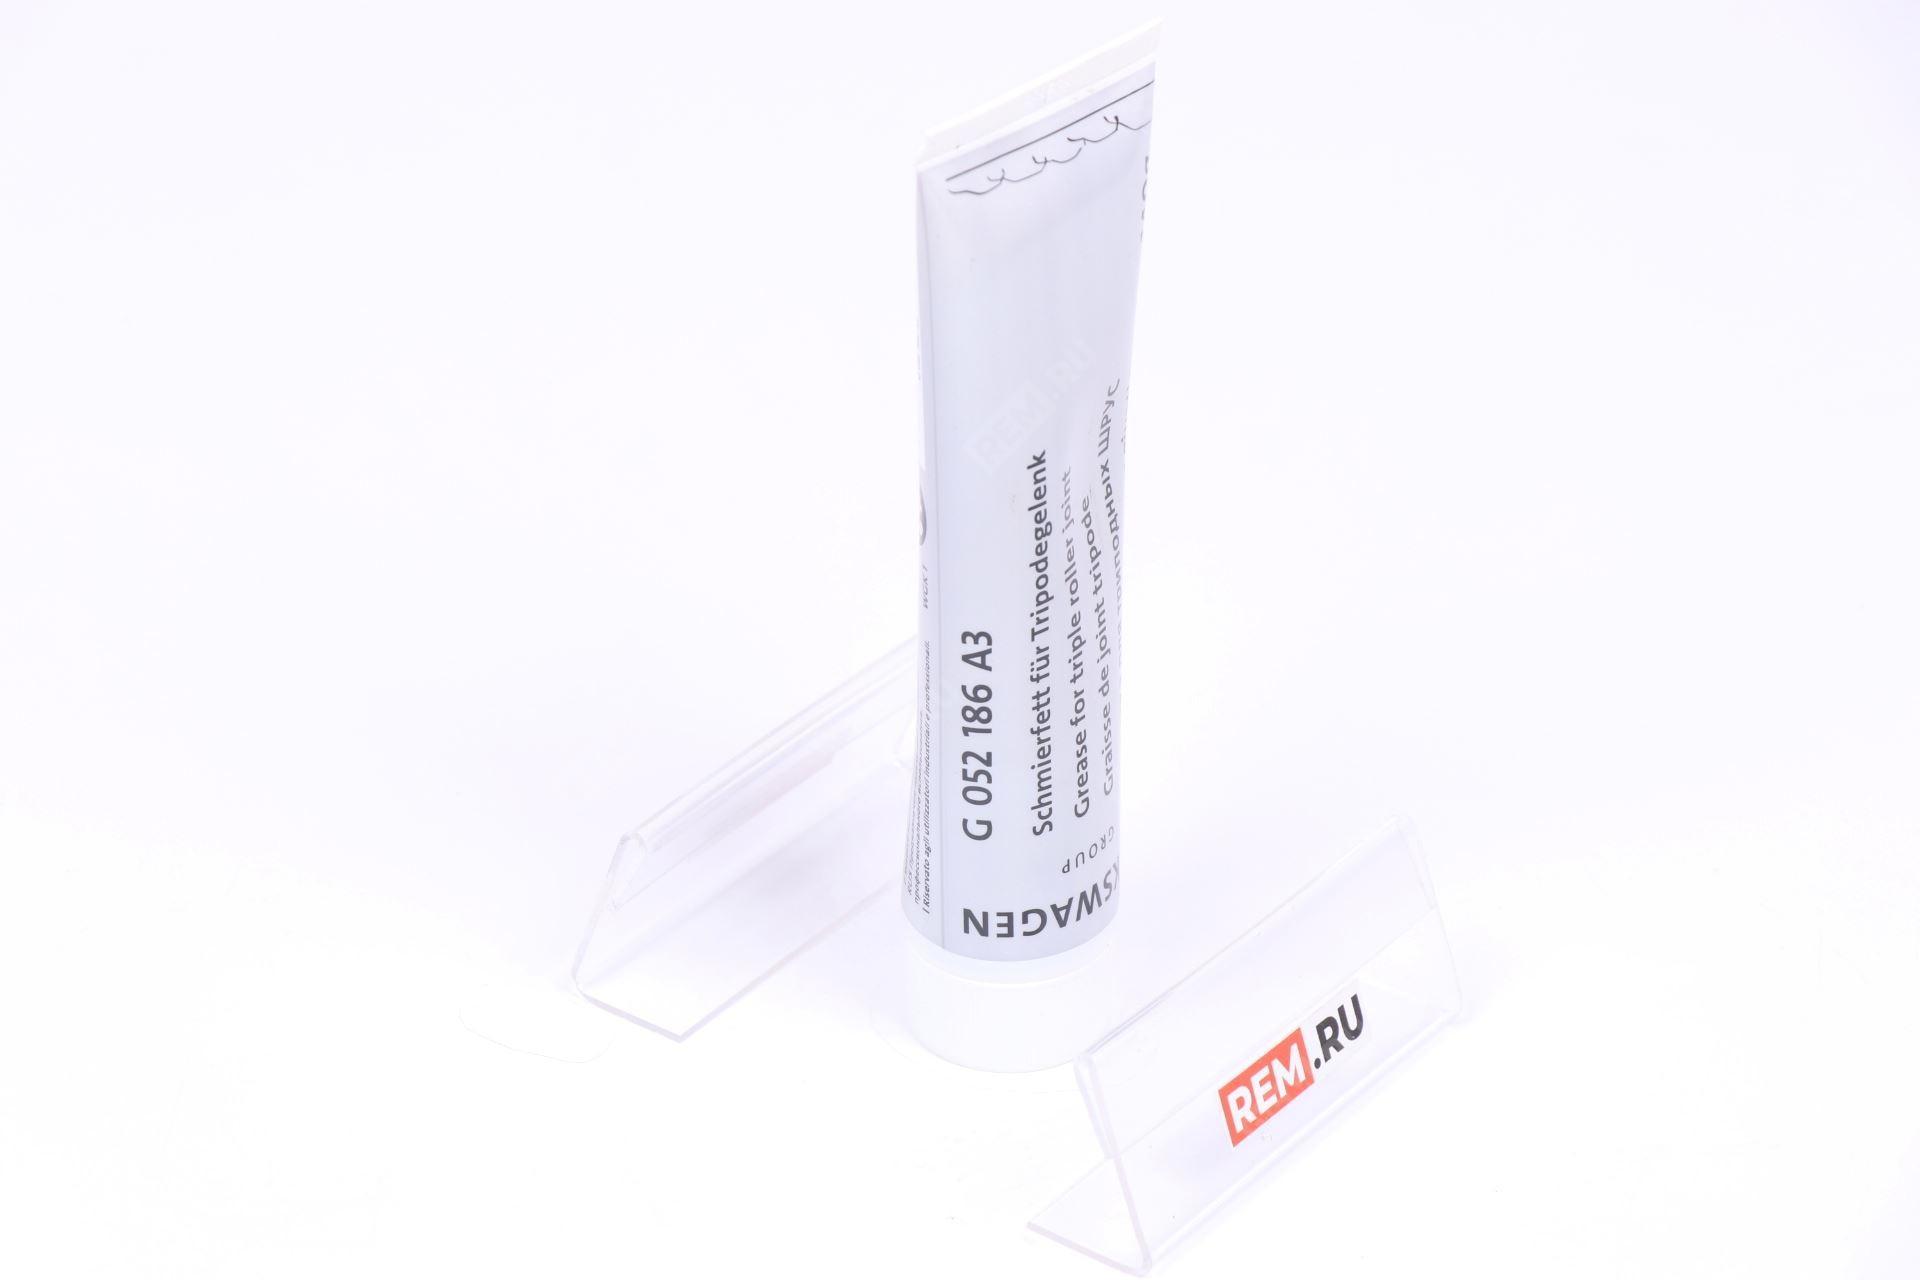 Смазка пластичная для высоких температур G052186A3